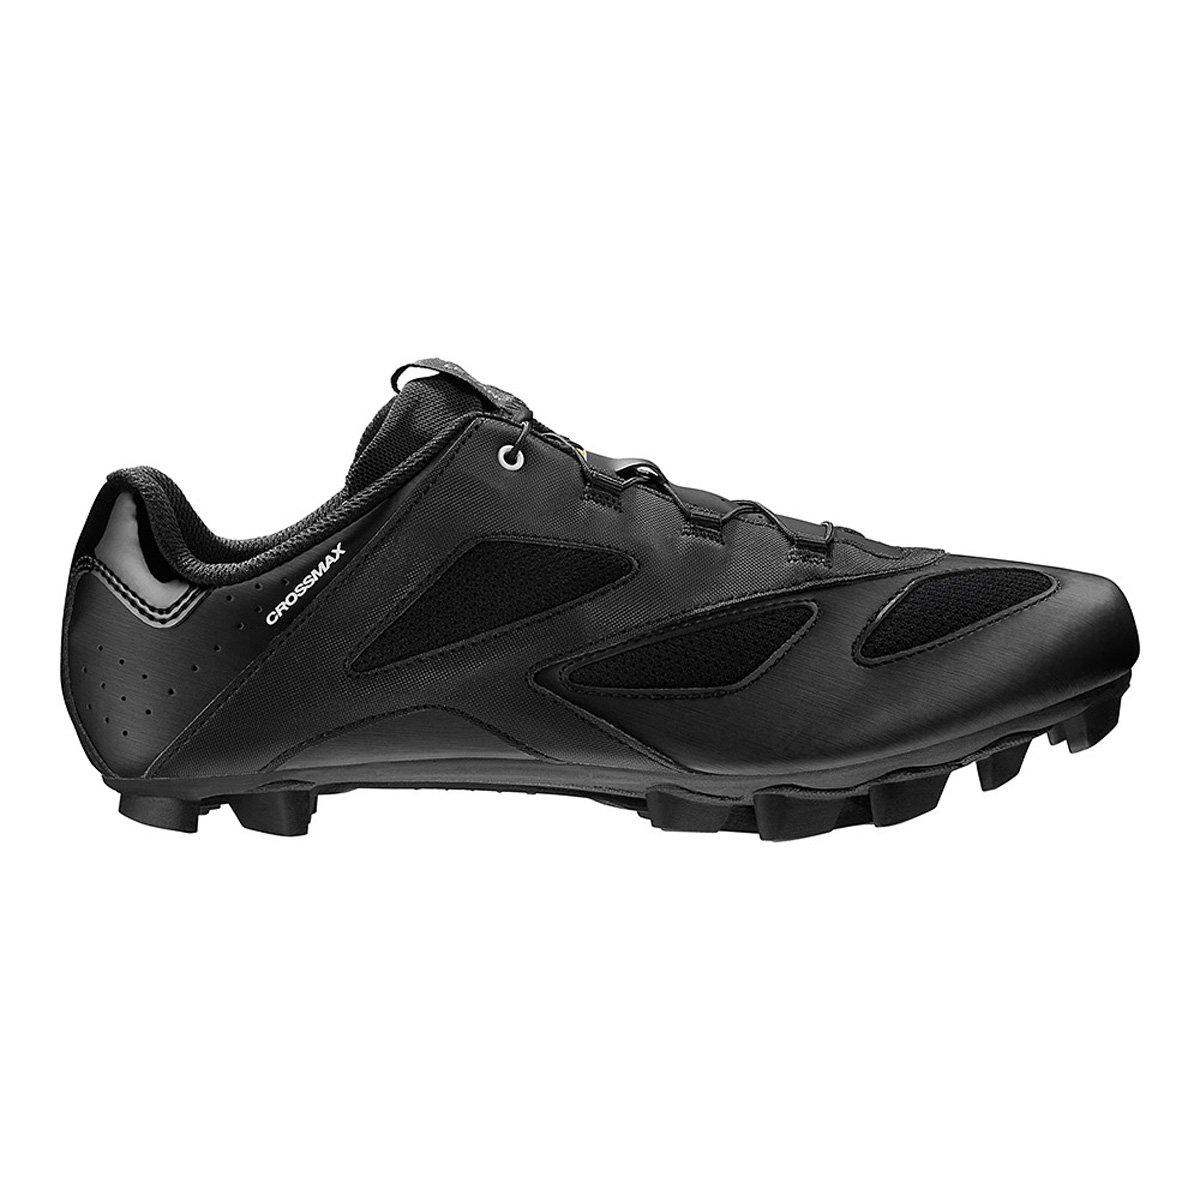 Mavic Crossmax MTB Cycling Shoe – Men 's B01M1UYX0O 13 F(M) UK / 13.5 D(M) US|ブラック ブラック 13 F(M) UK / 13.5 D(M) US